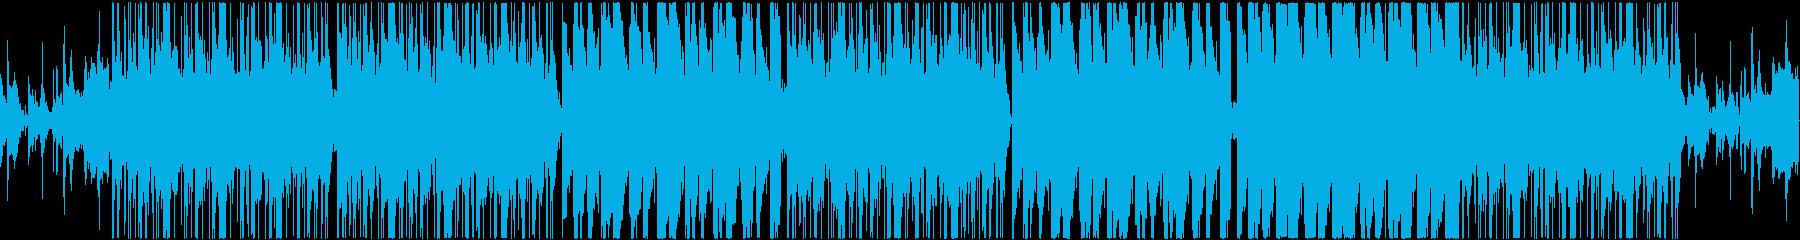 [lo-fi hip-hop] ダーク感の再生済みの波形